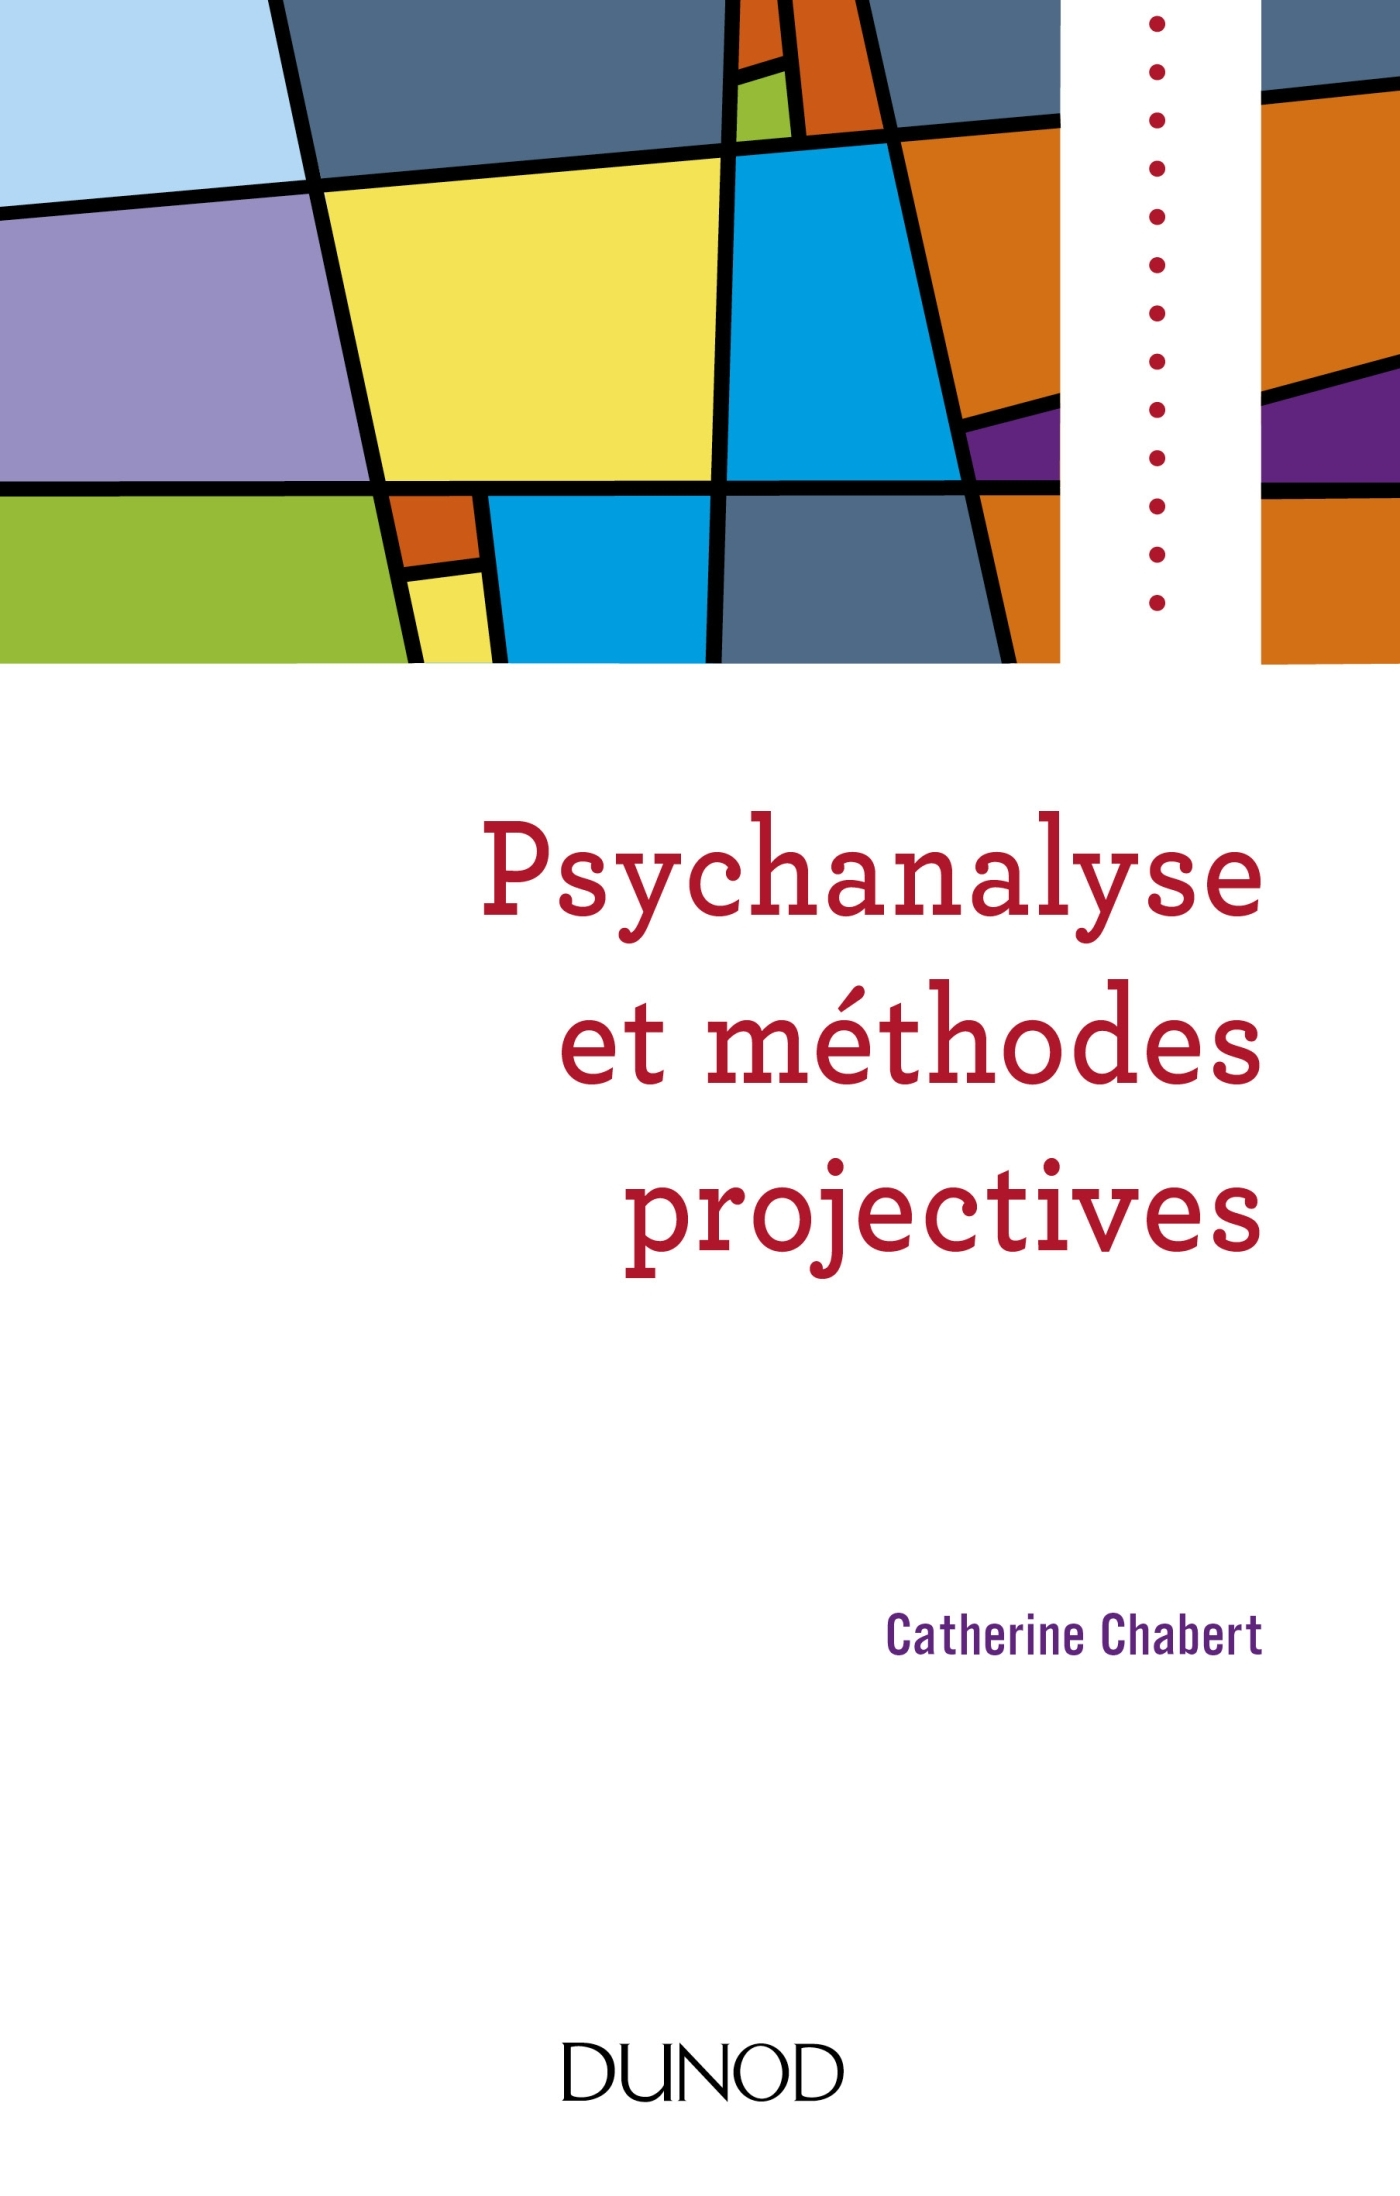 PSYCHANALYSE ET METHODES PROJECTIVES